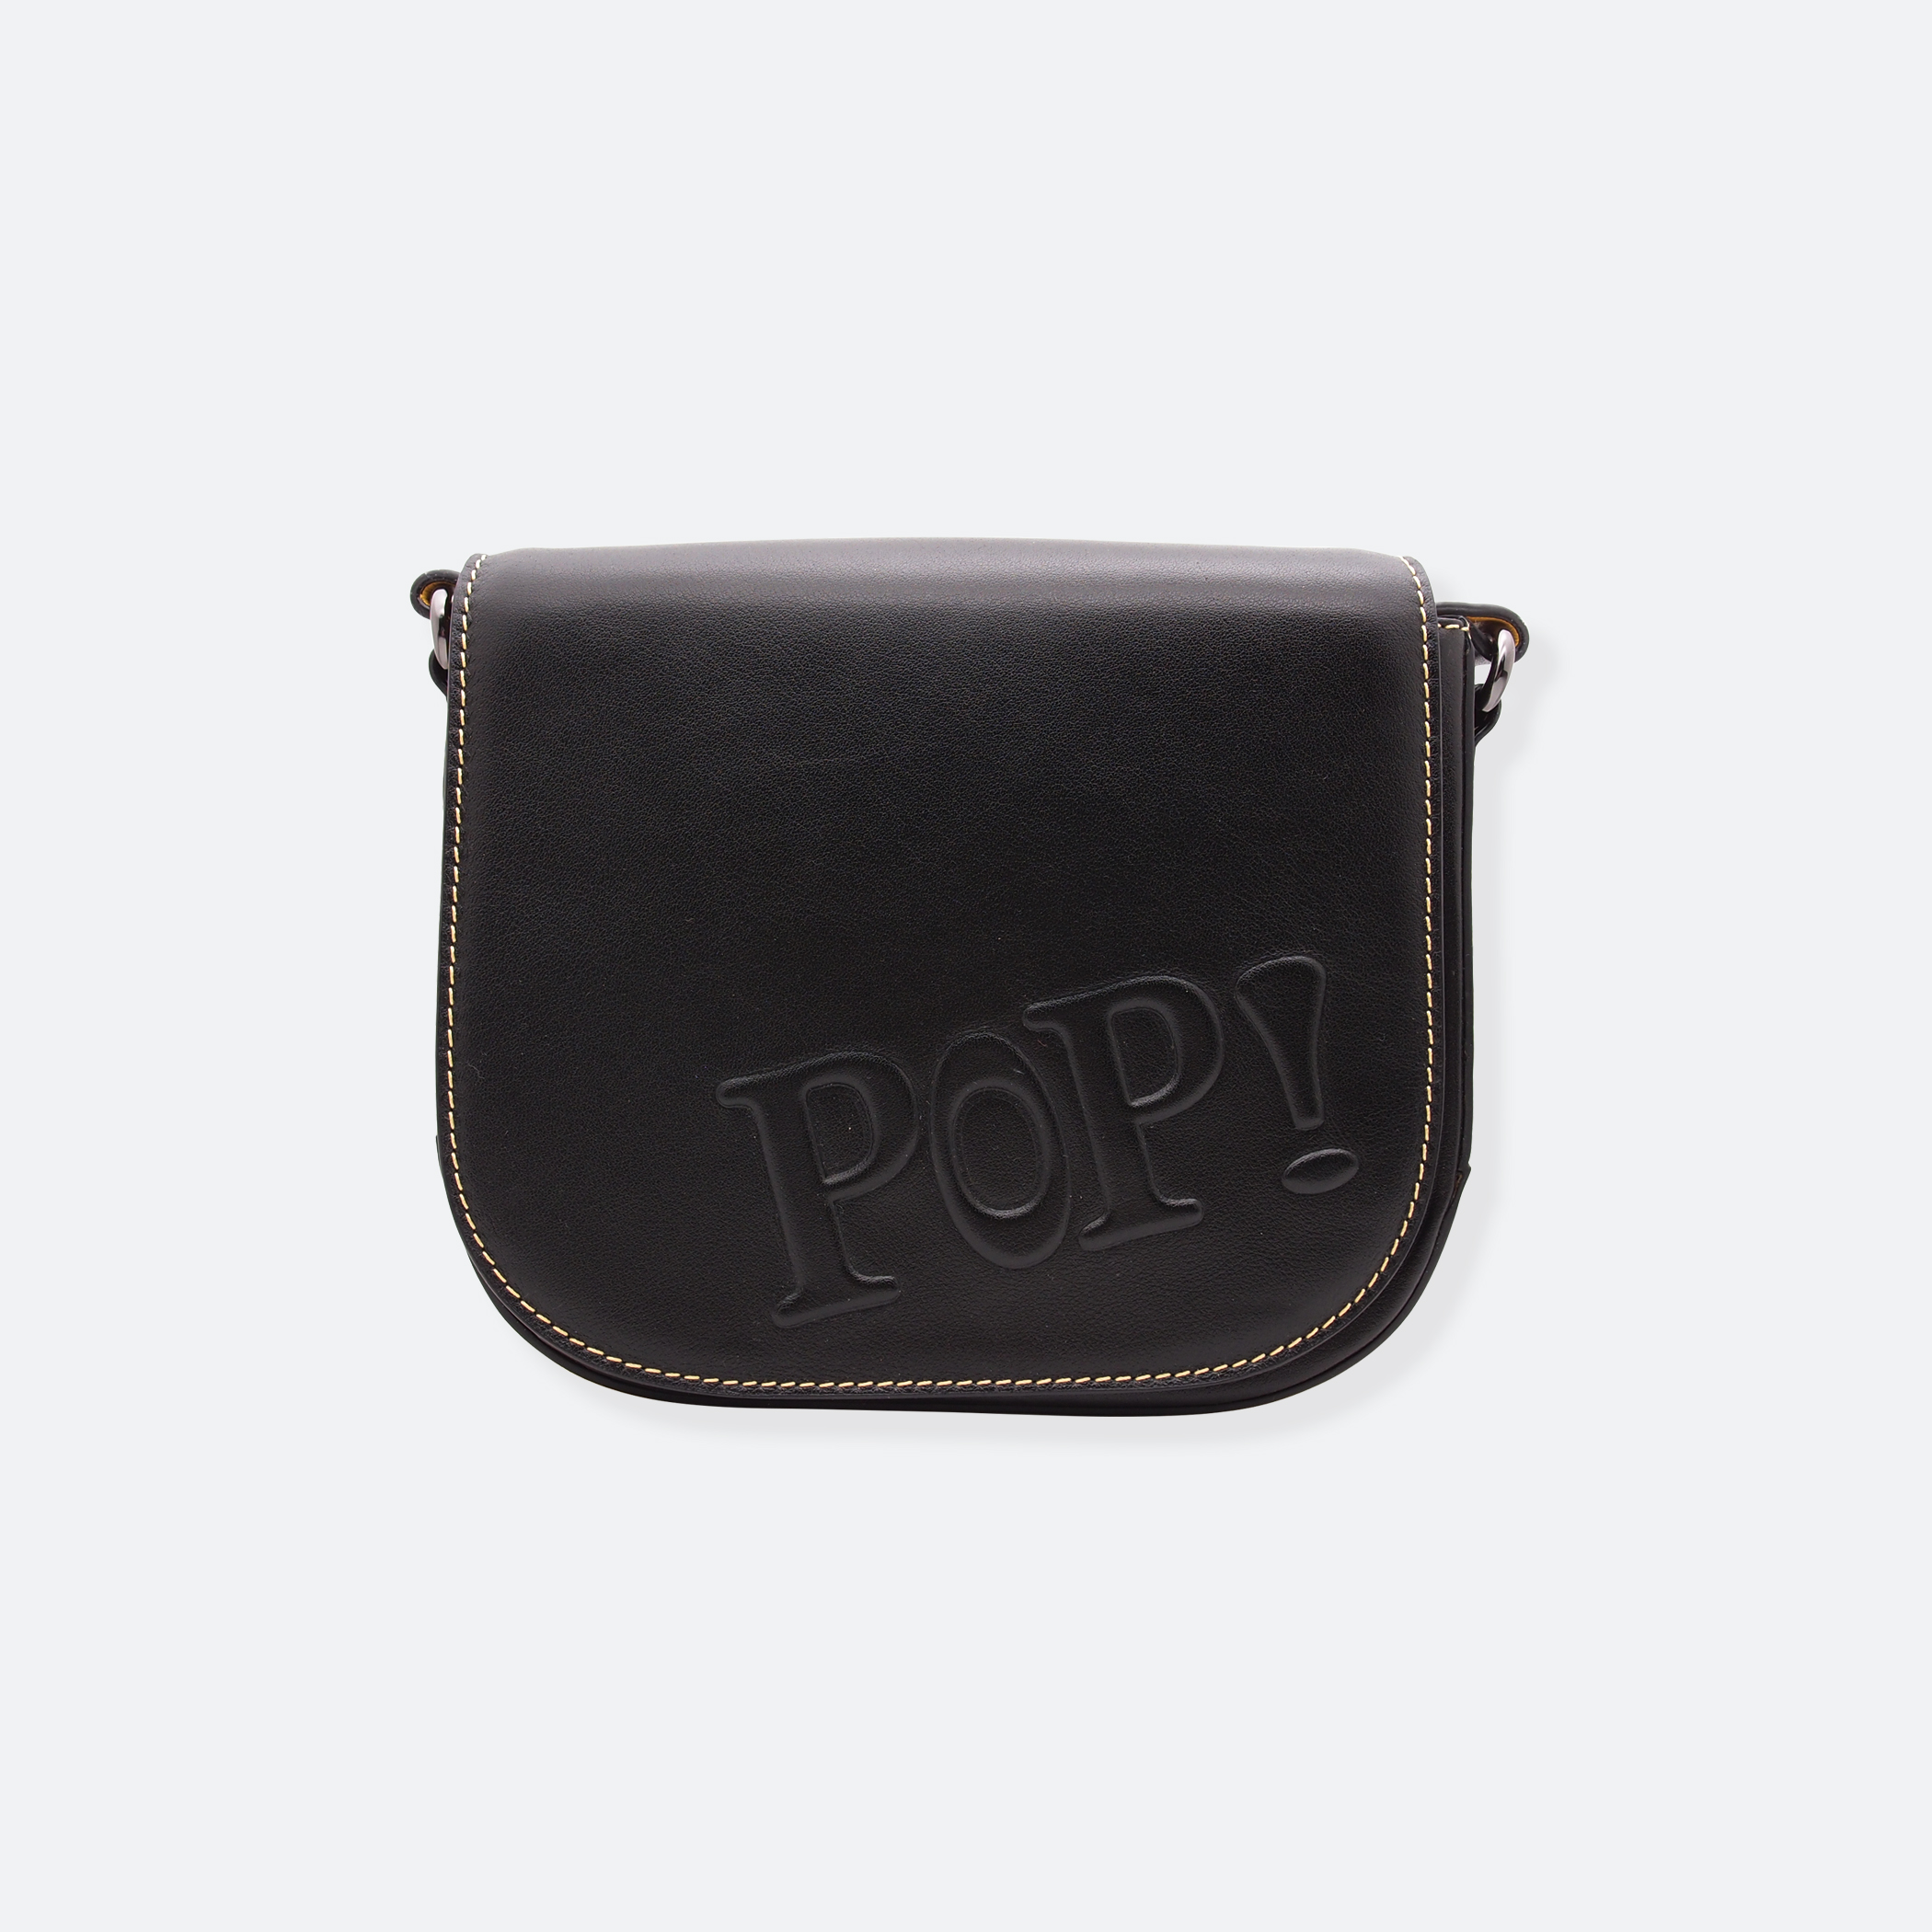 OhMart POP! Bag(Black-Yellow) 1